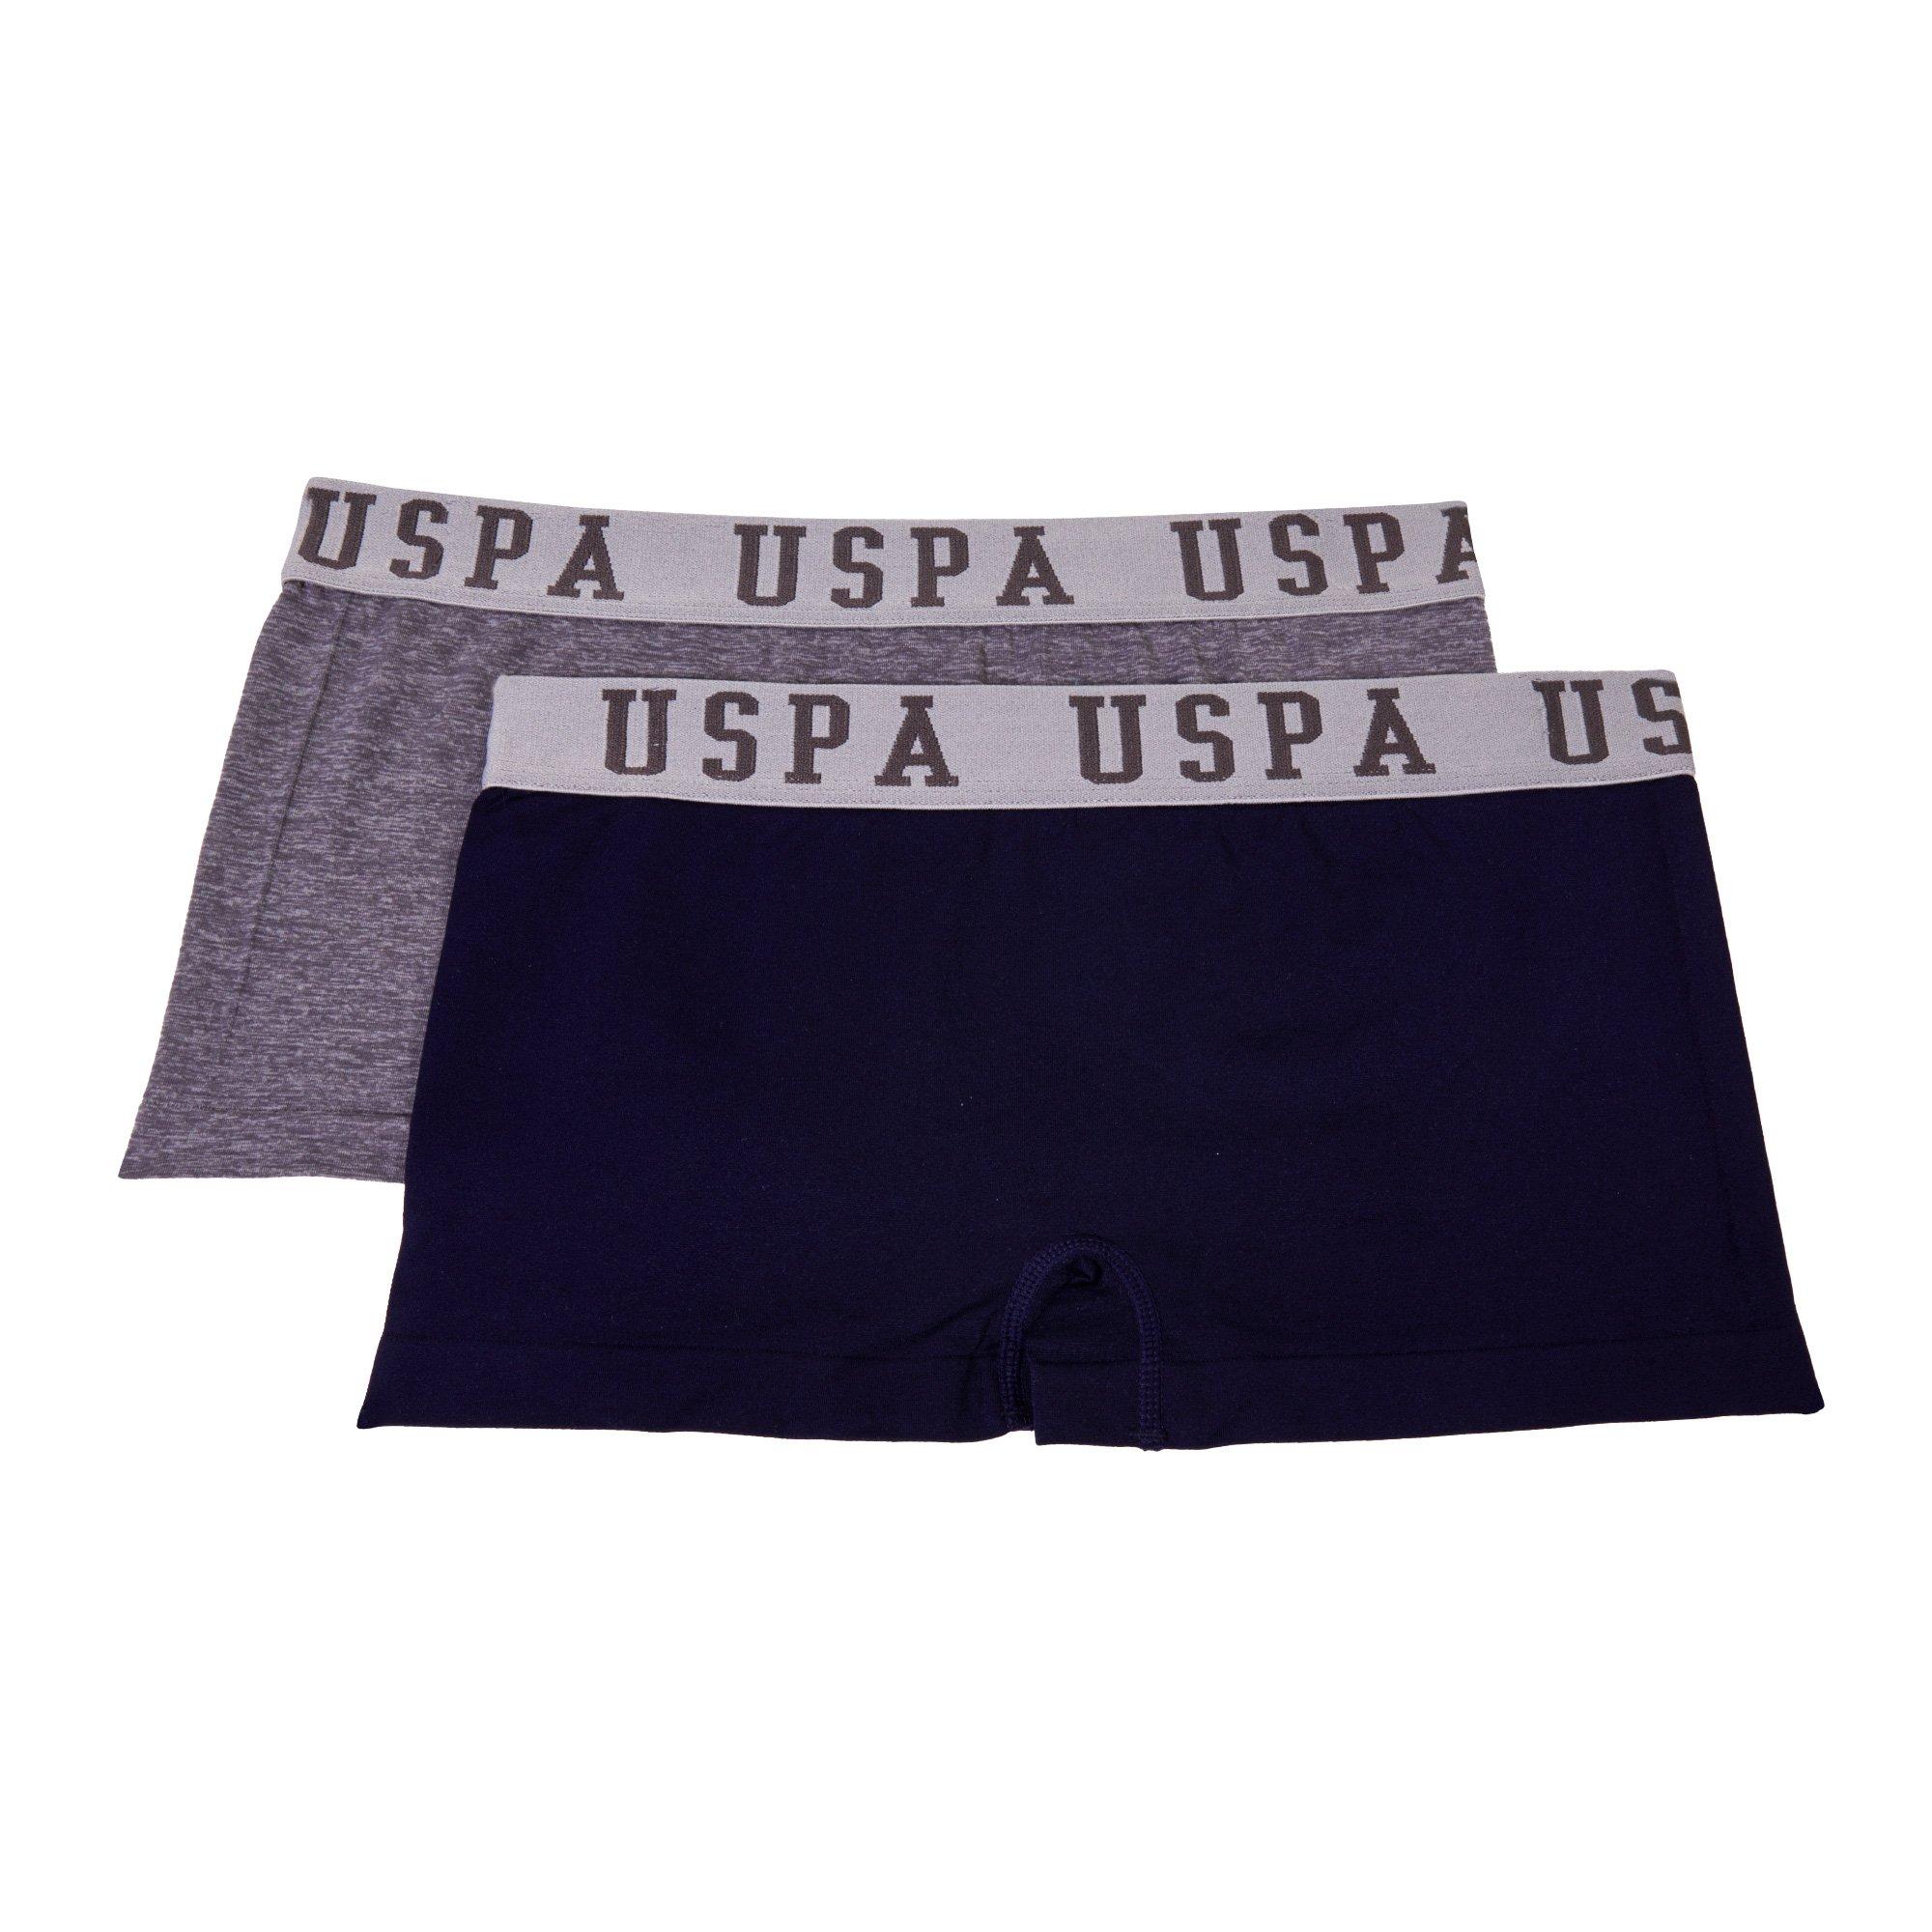 U.S. Polo Assn.. Womens 2 Pack Boyshort Panties Set Heather Grey/Black Medium